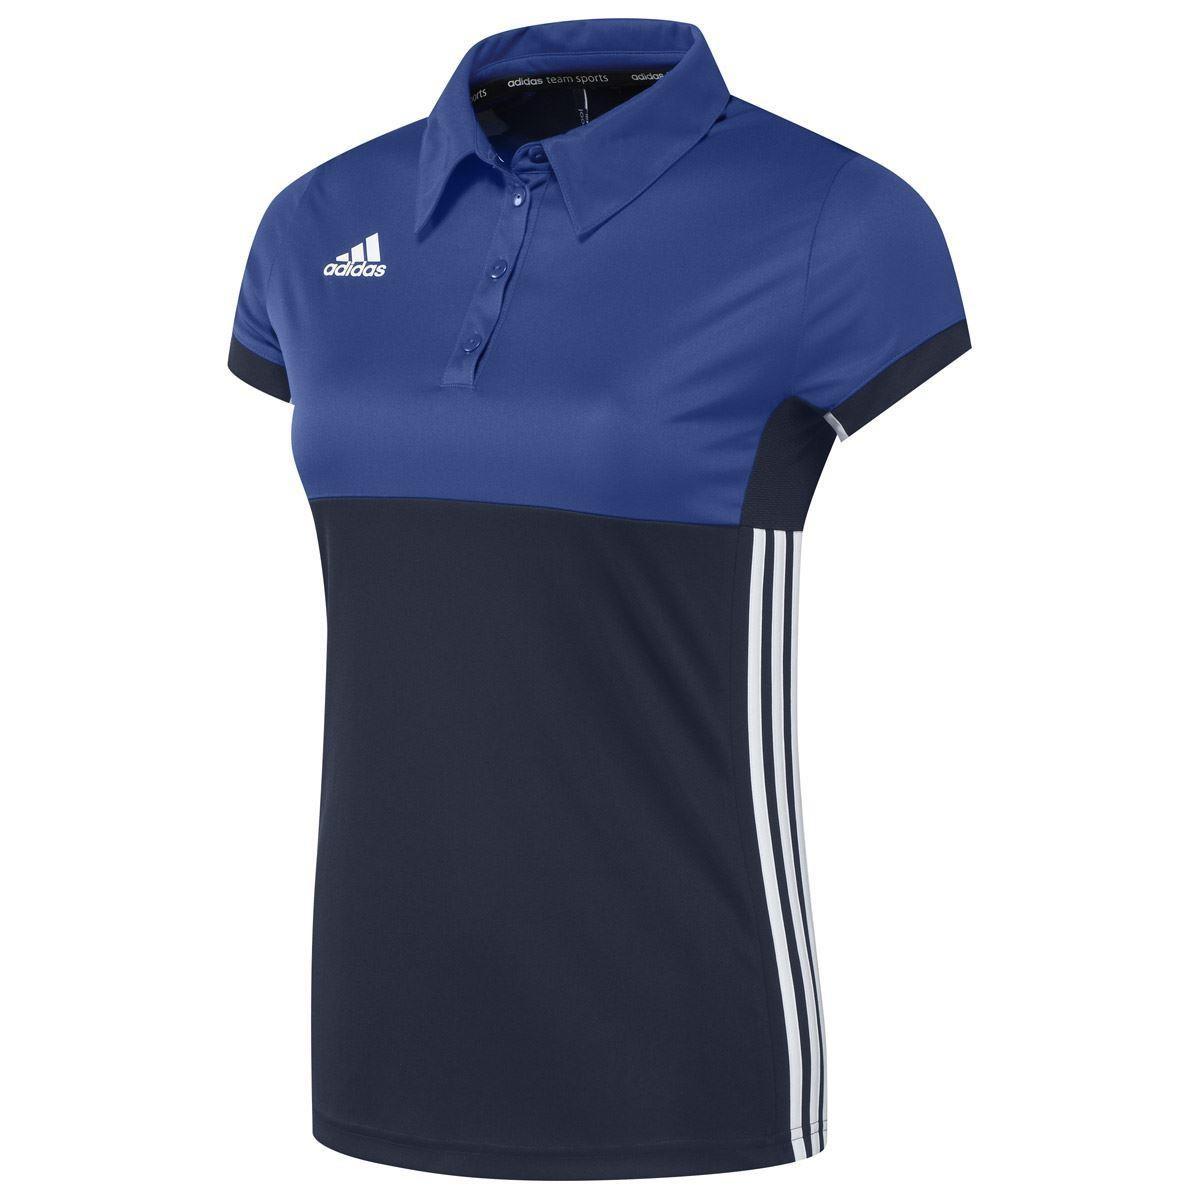 Hockey Clothing And Teamwear Ladies Hockey Shirts